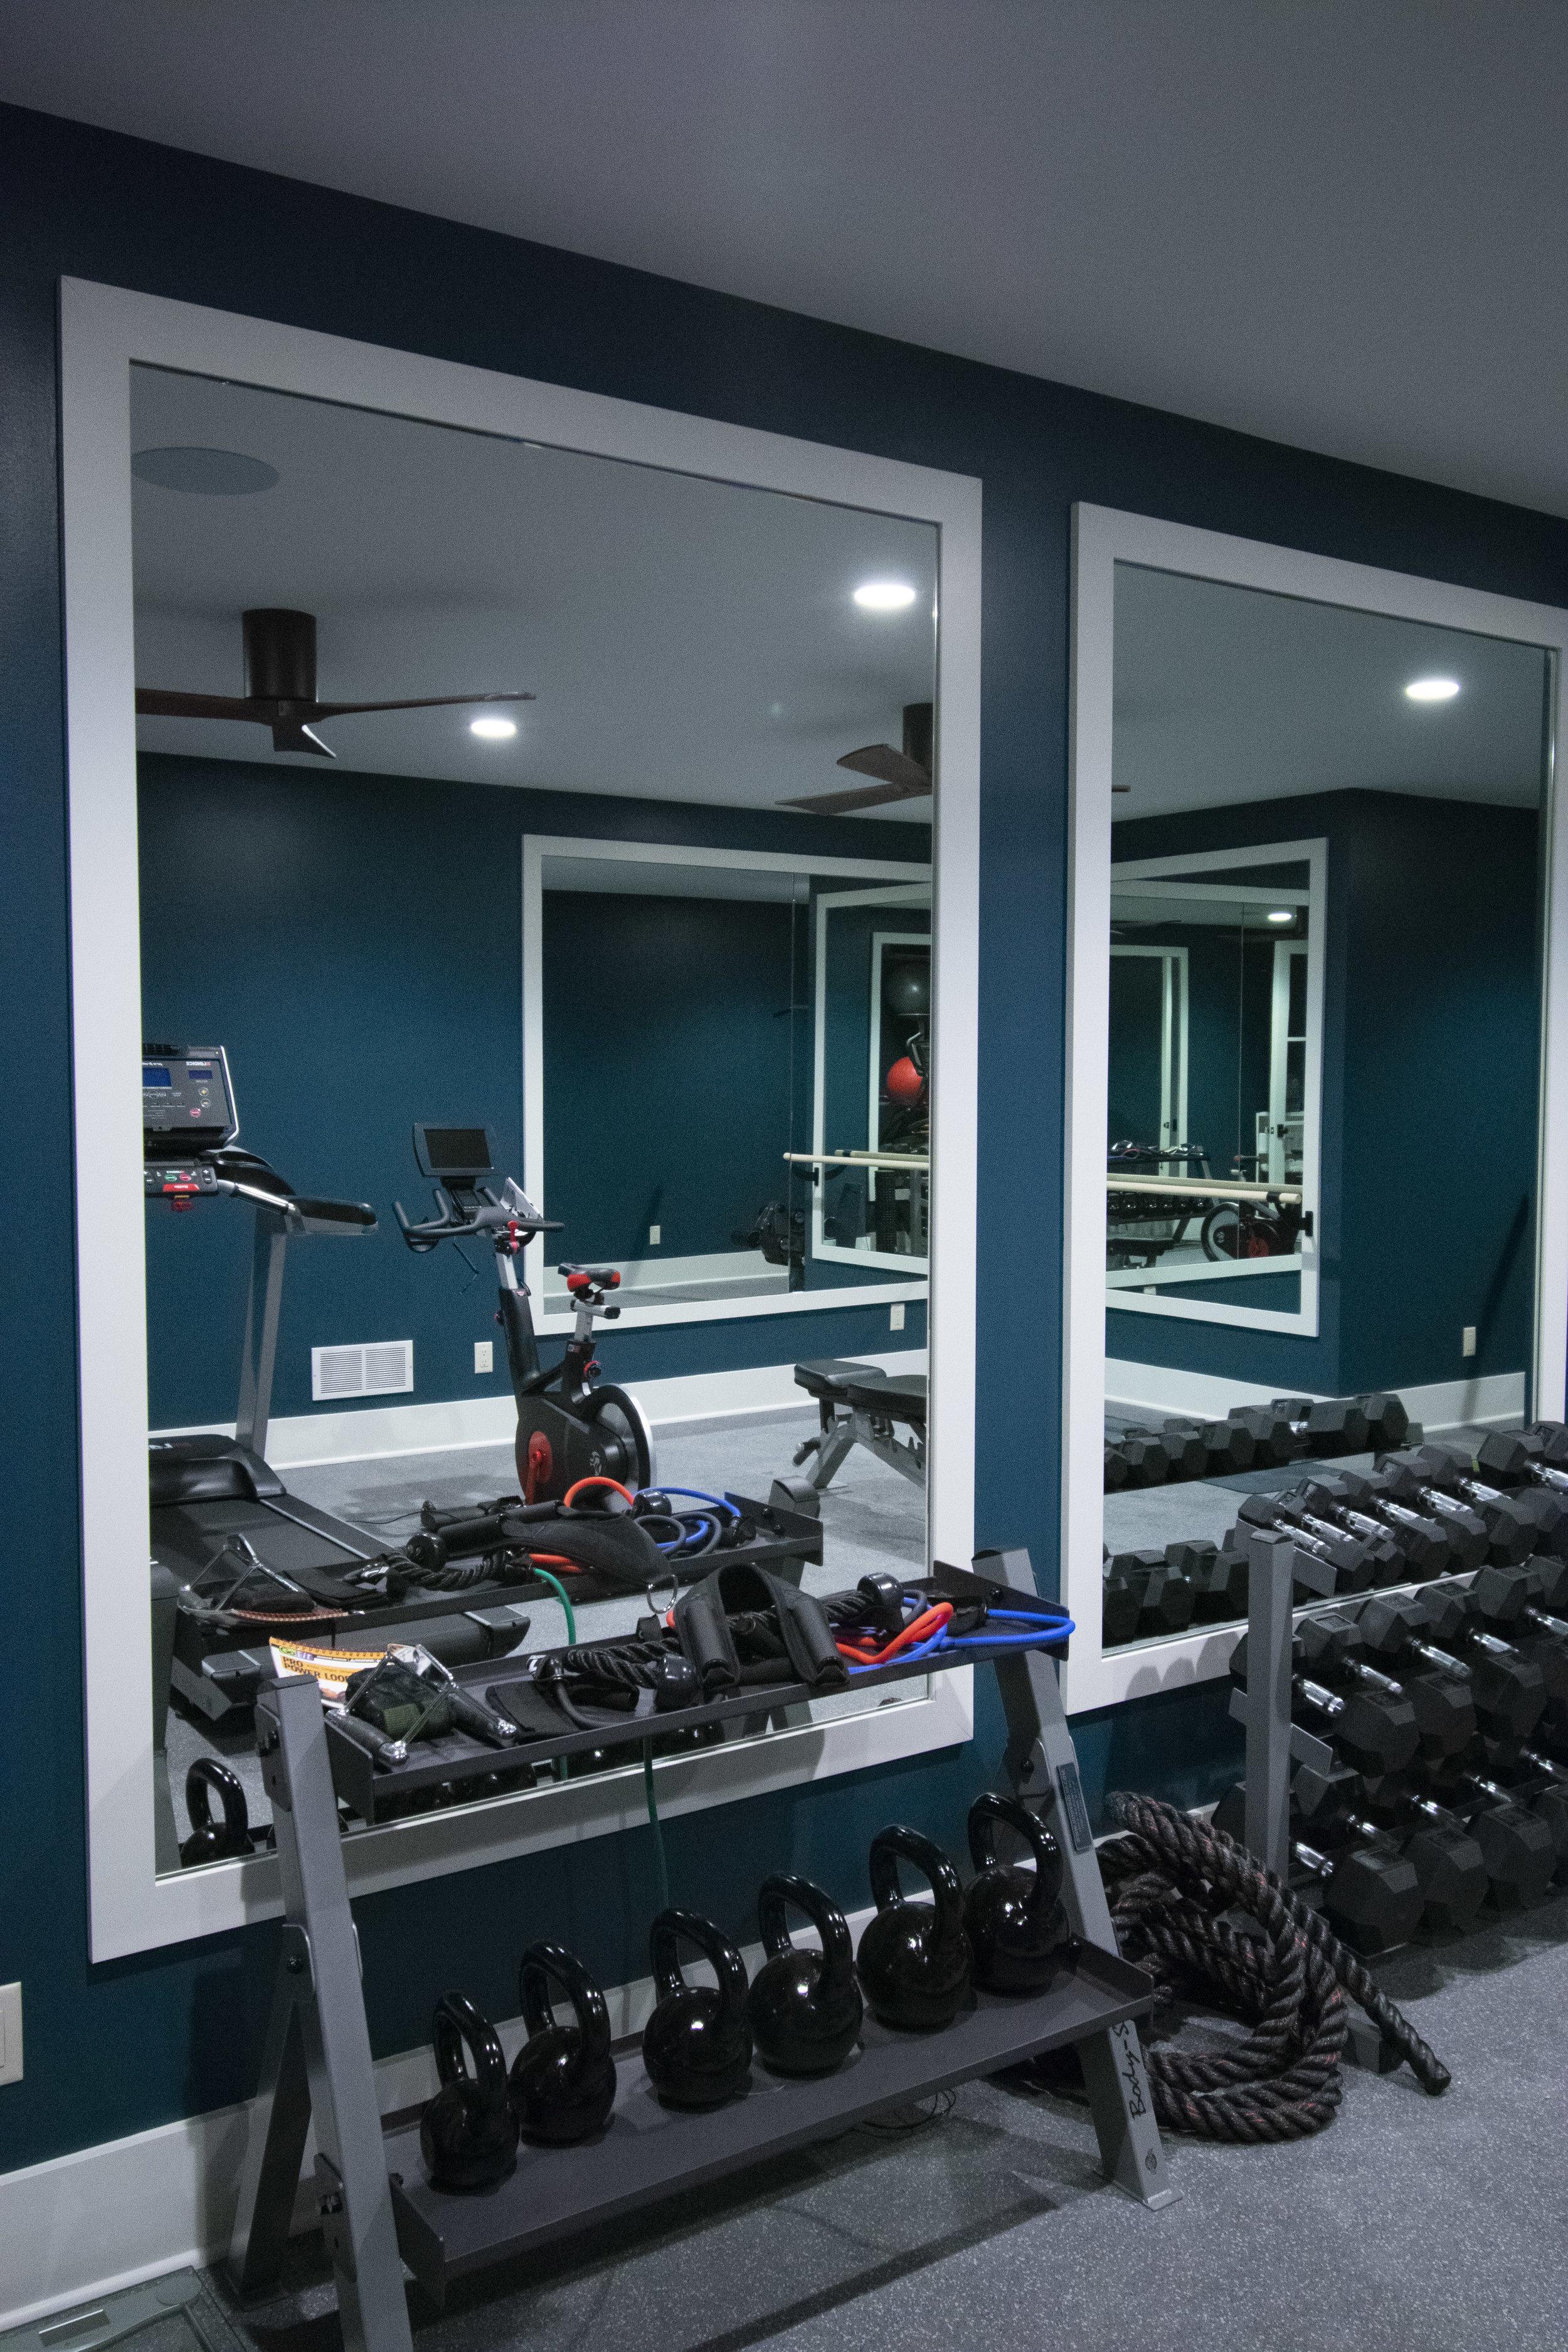 Custom wall mirrors 8-7-18 1.jpg